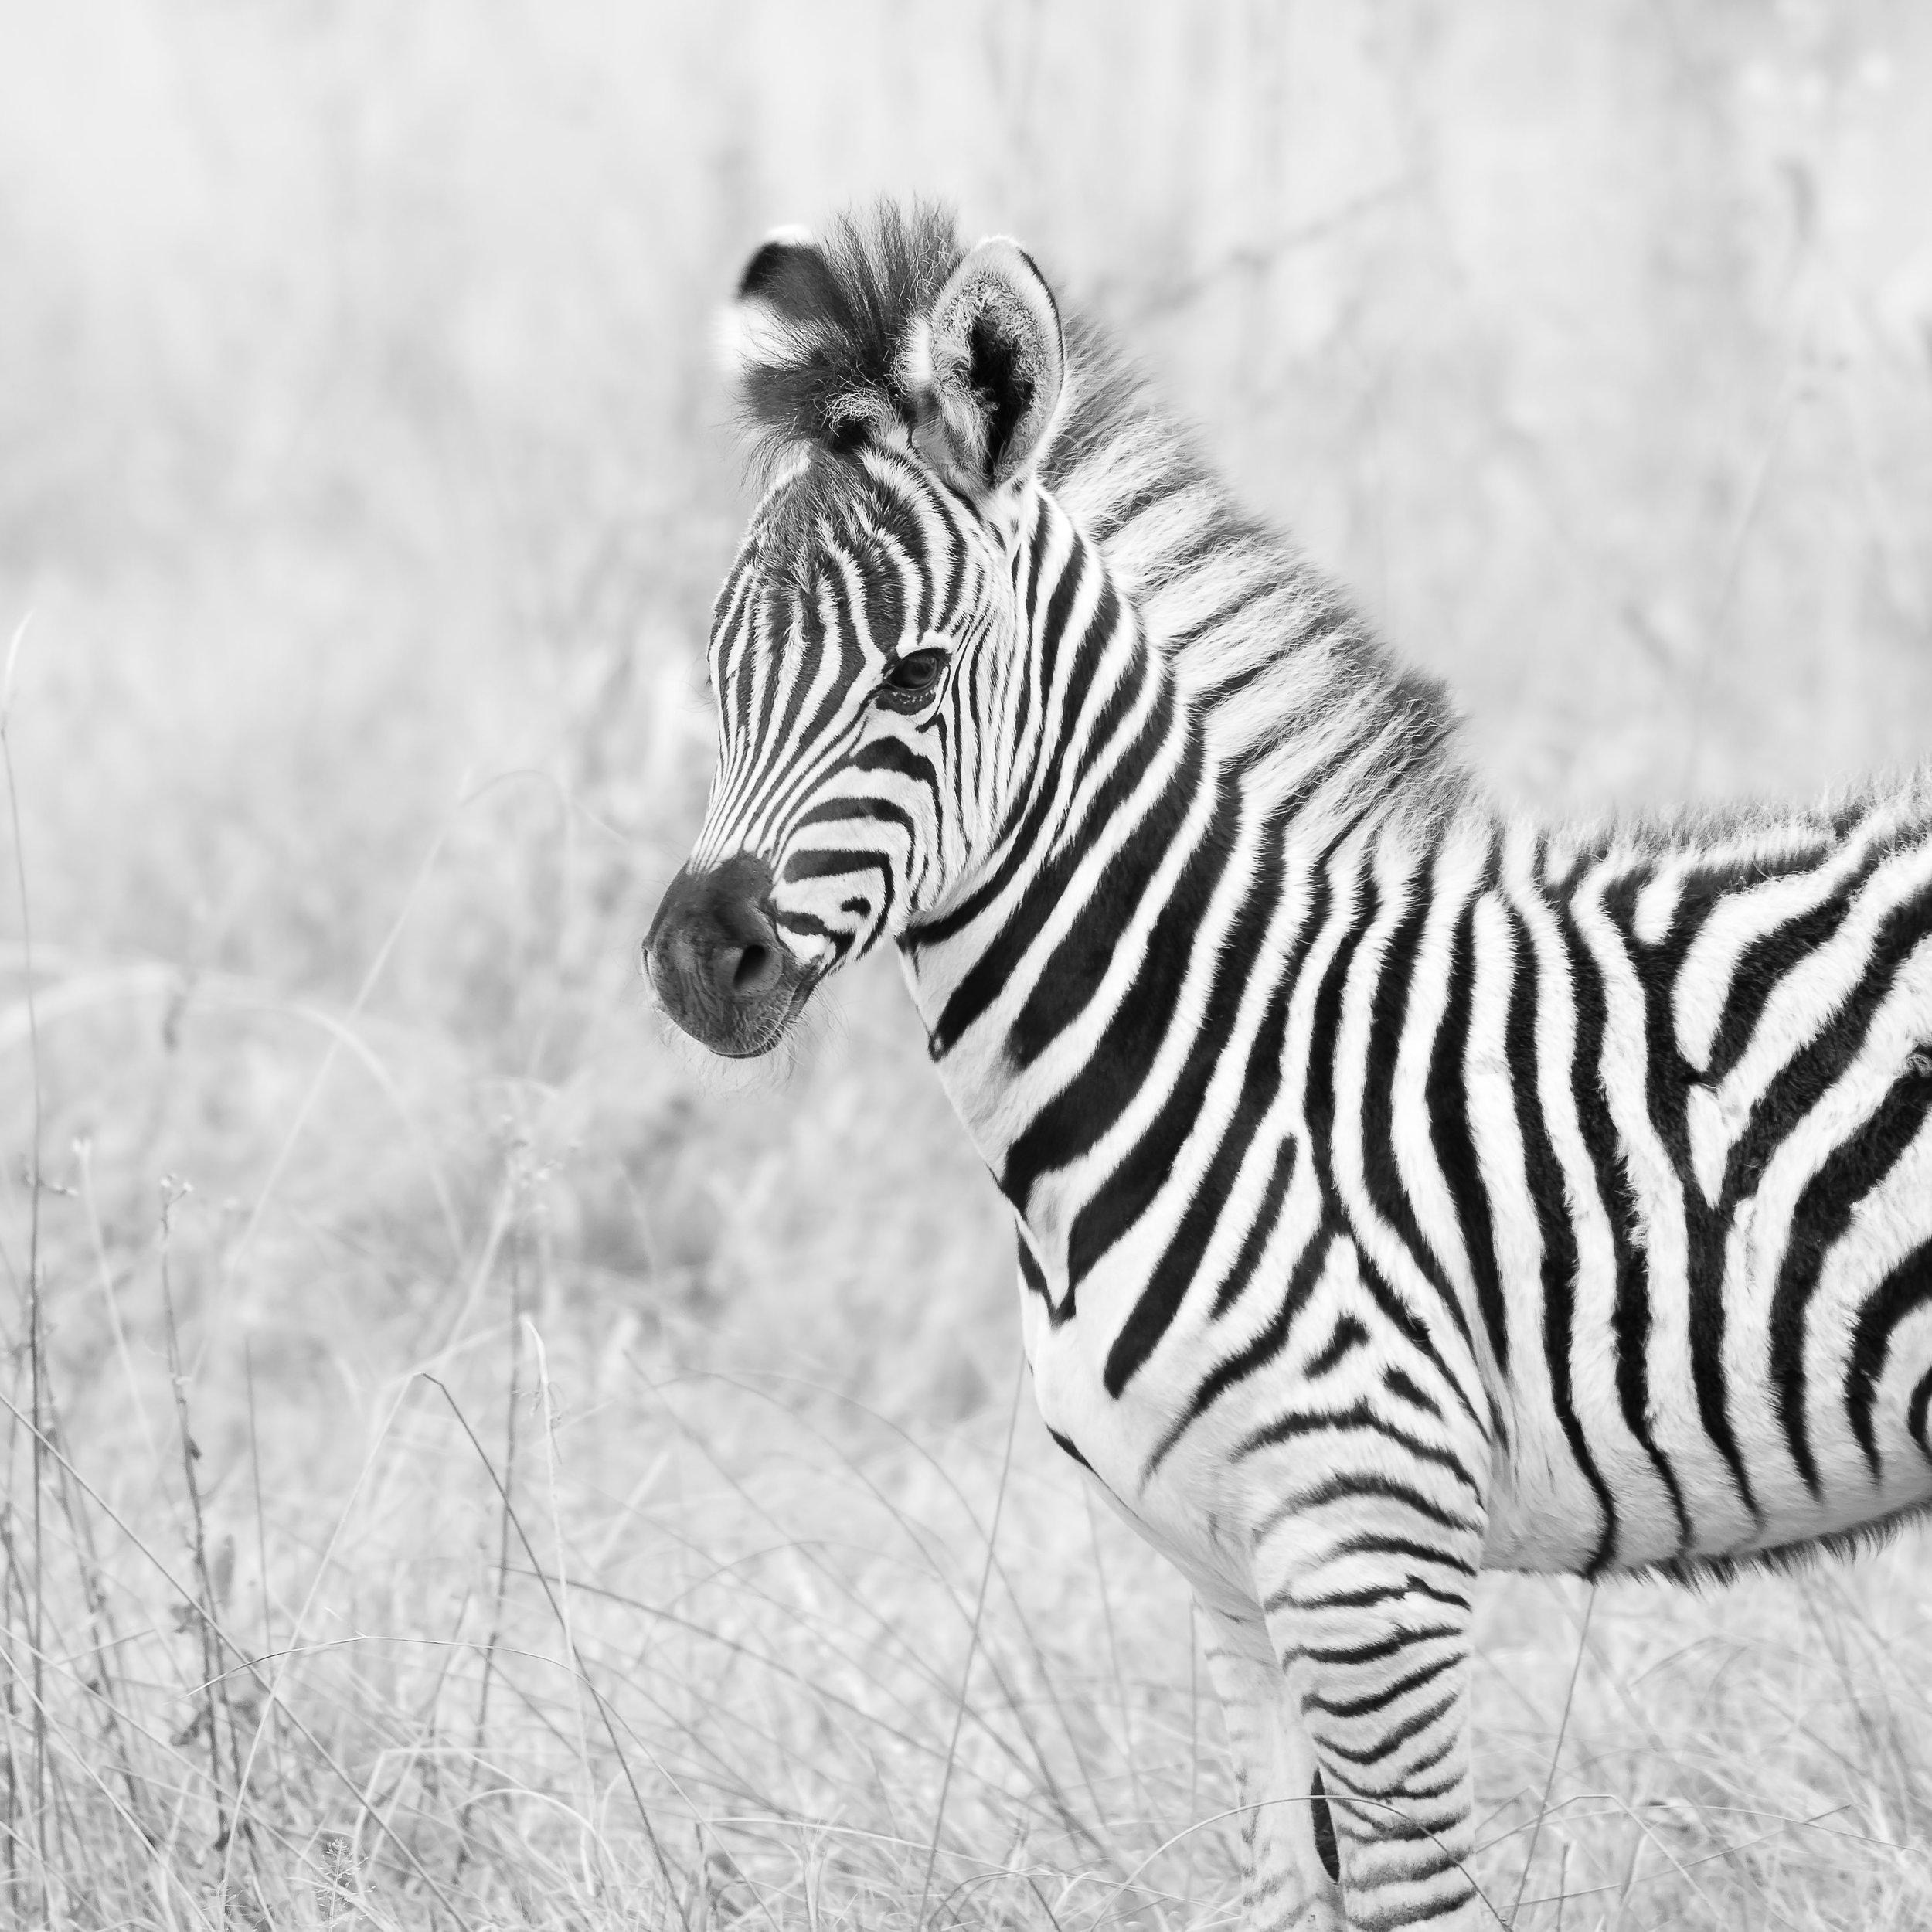 Erin-Fabio-Photography-Africa-2018-47.jpg